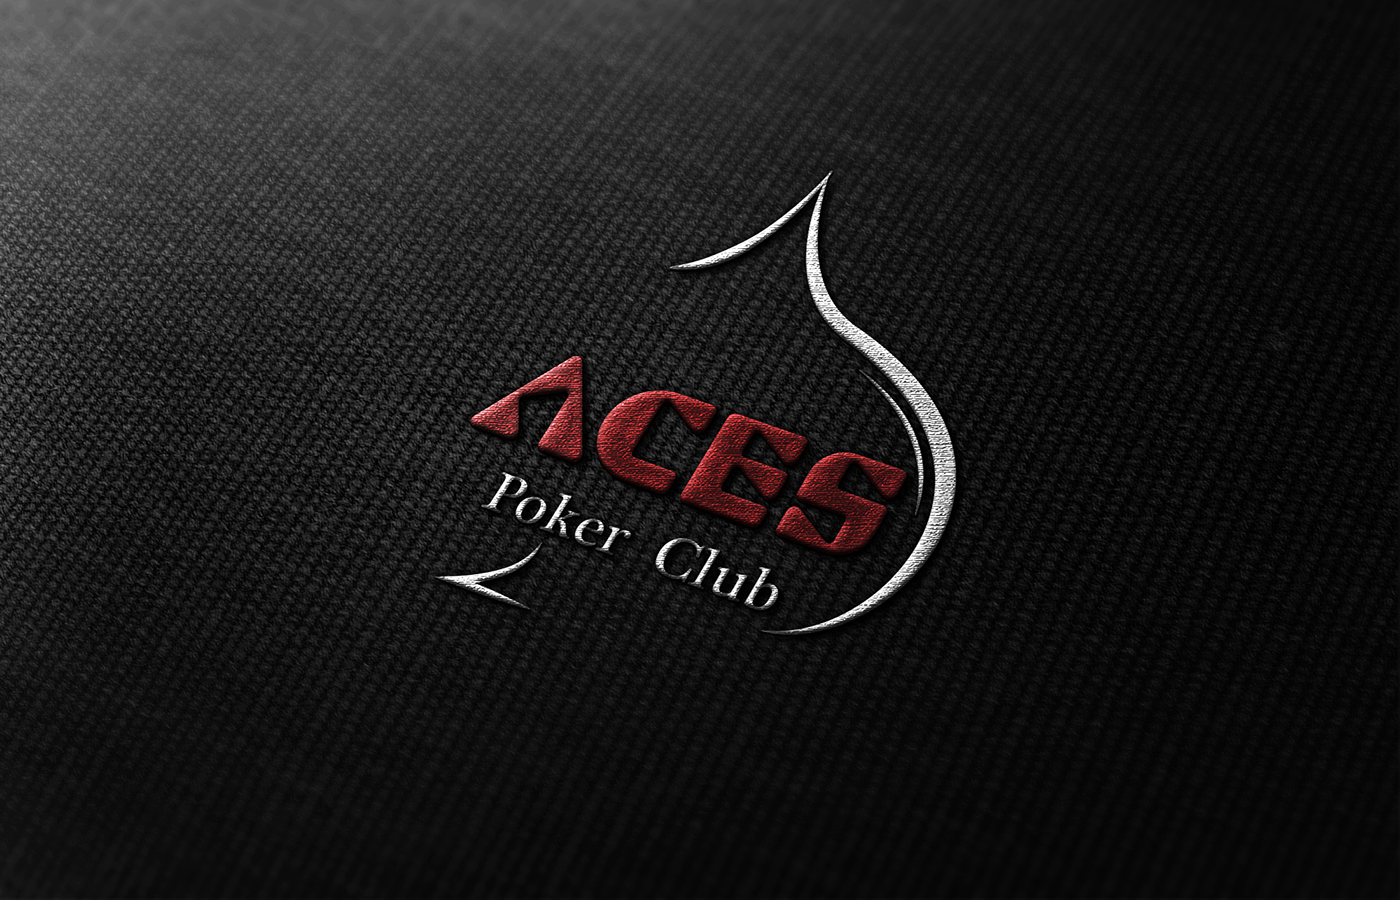 Aces Poker Club